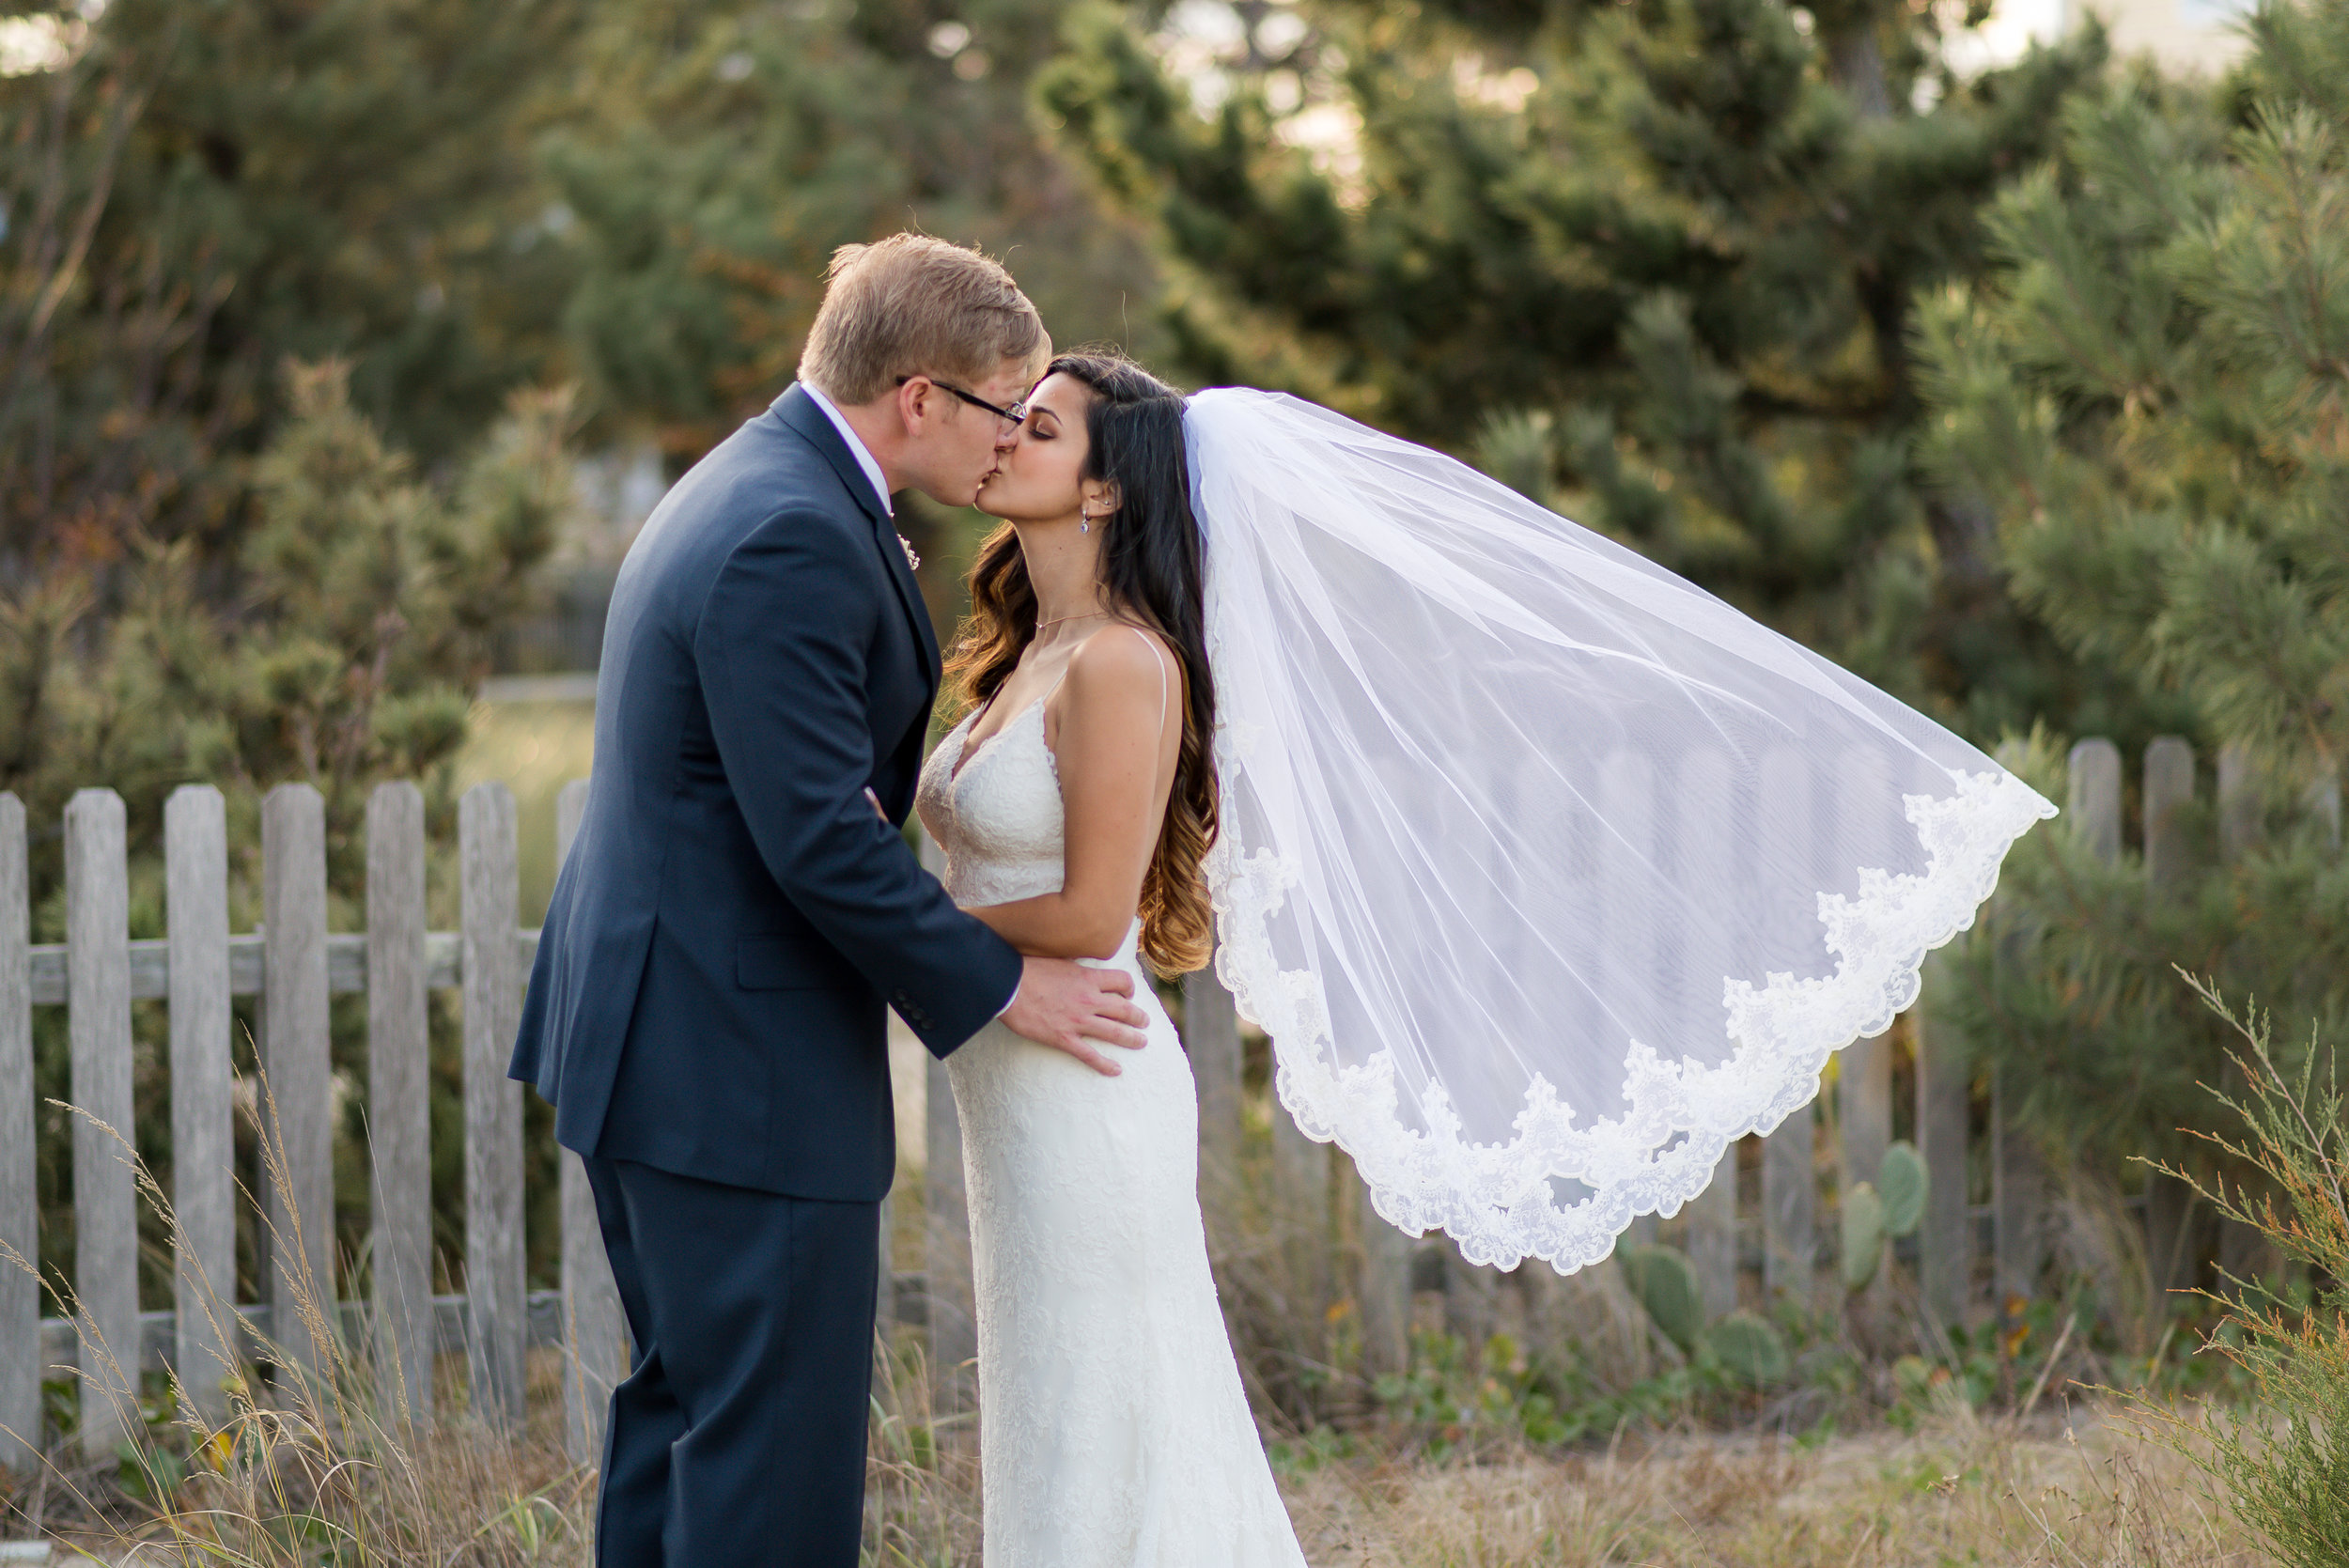 Erica + Robert Married445 copy.jpg